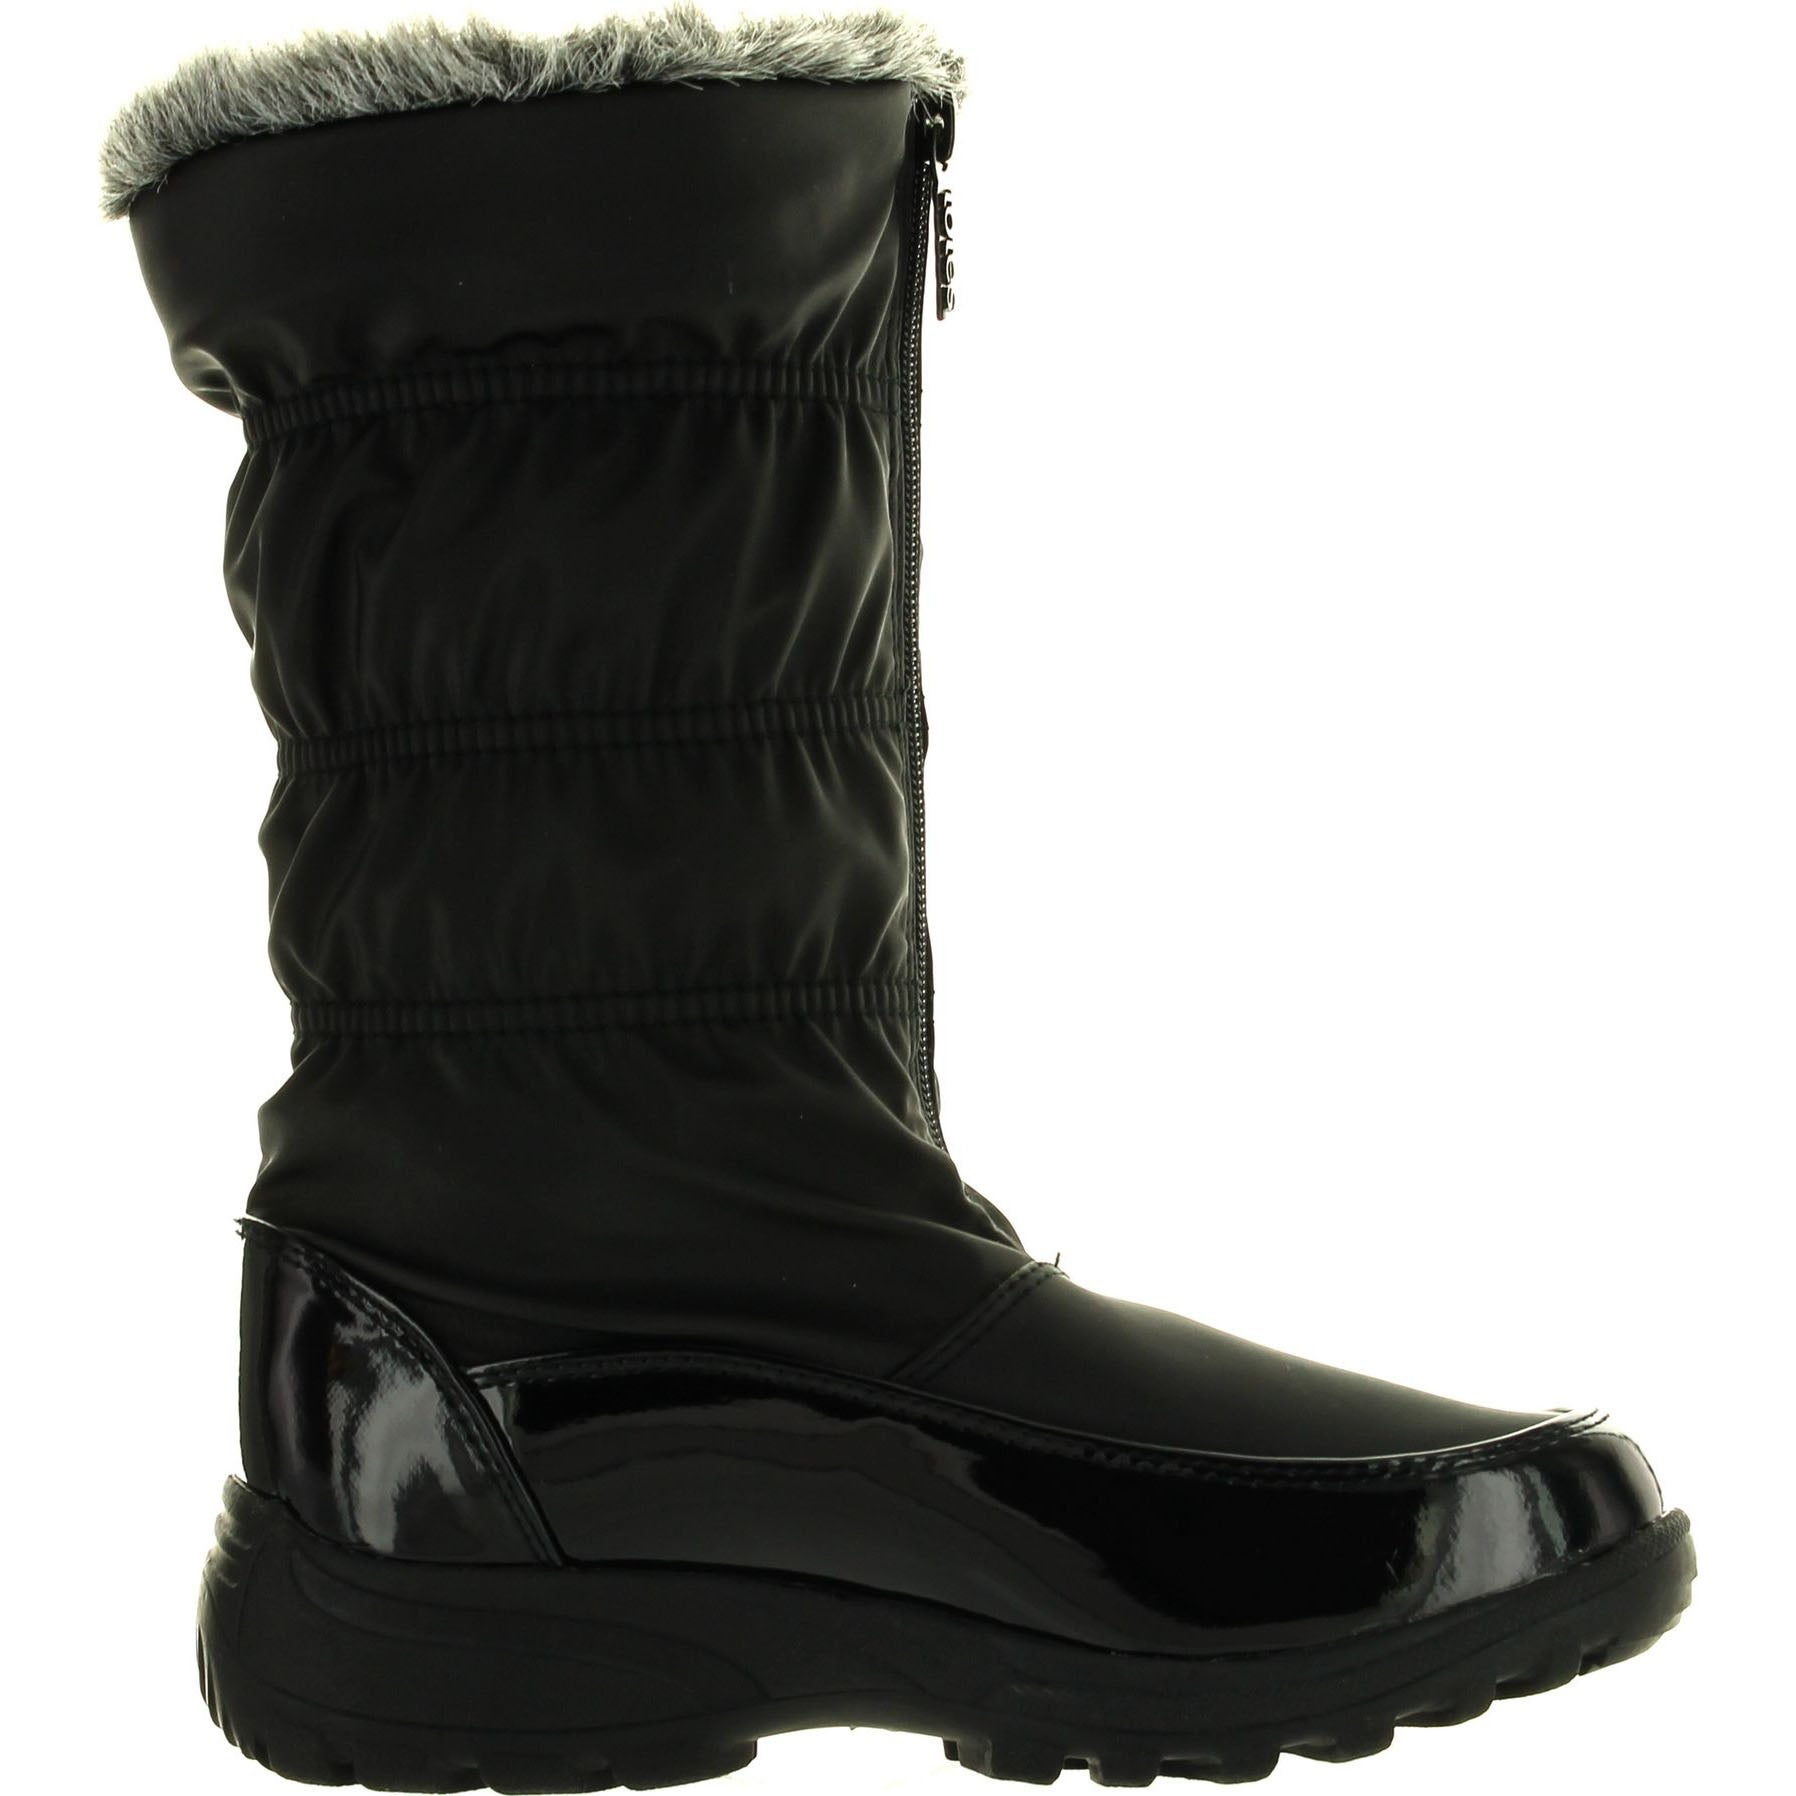 Shop Totes Damenschuhe Rachel Winter Waterproof schwarz Snow Stiefel schwarz Waterproof Free ... f7fb56